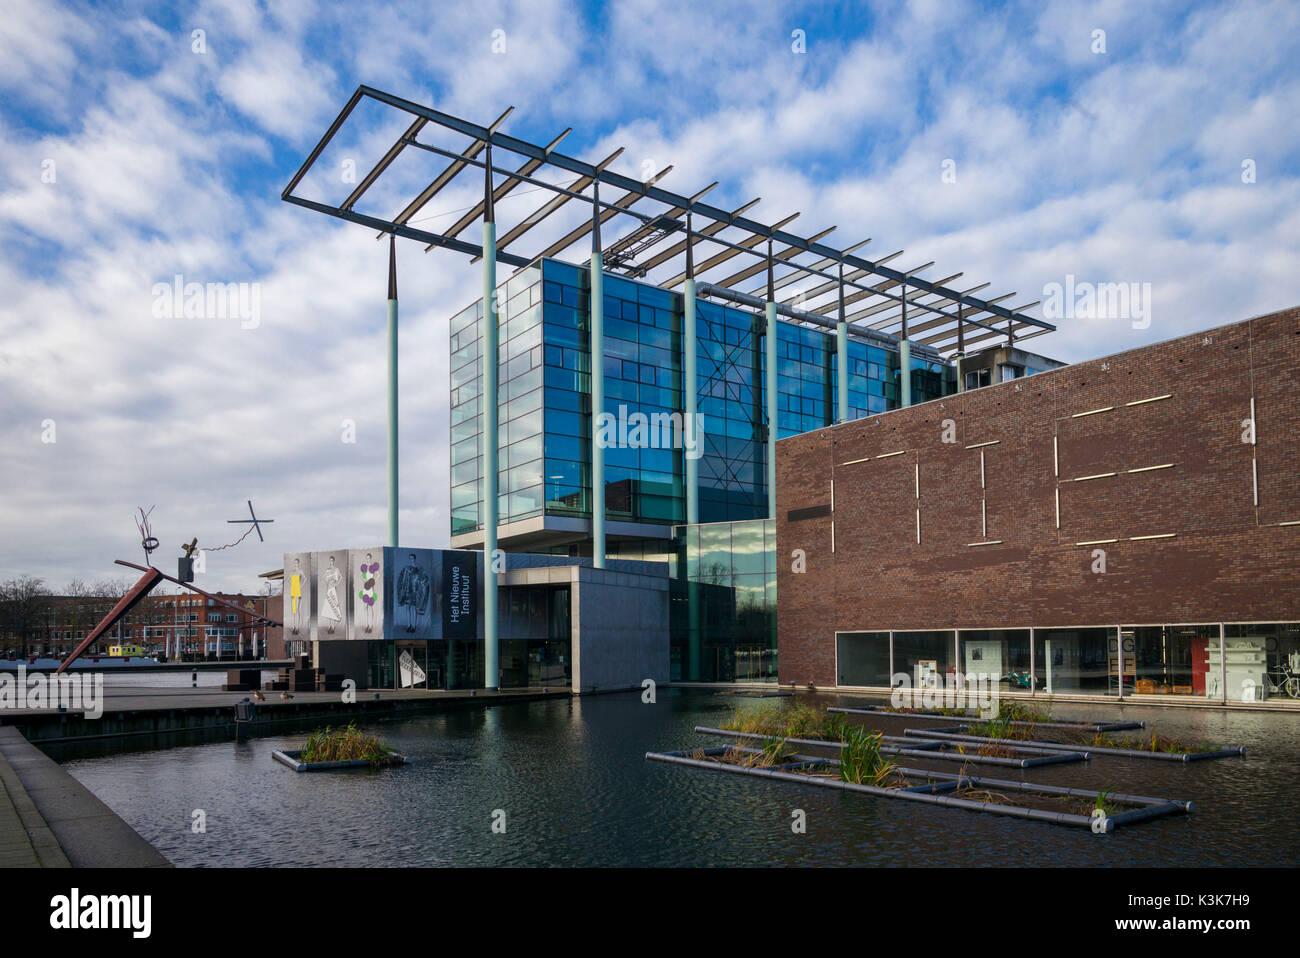 Niederlande, Rotterdam, Het Nieuwe Instituut, Institut für ...